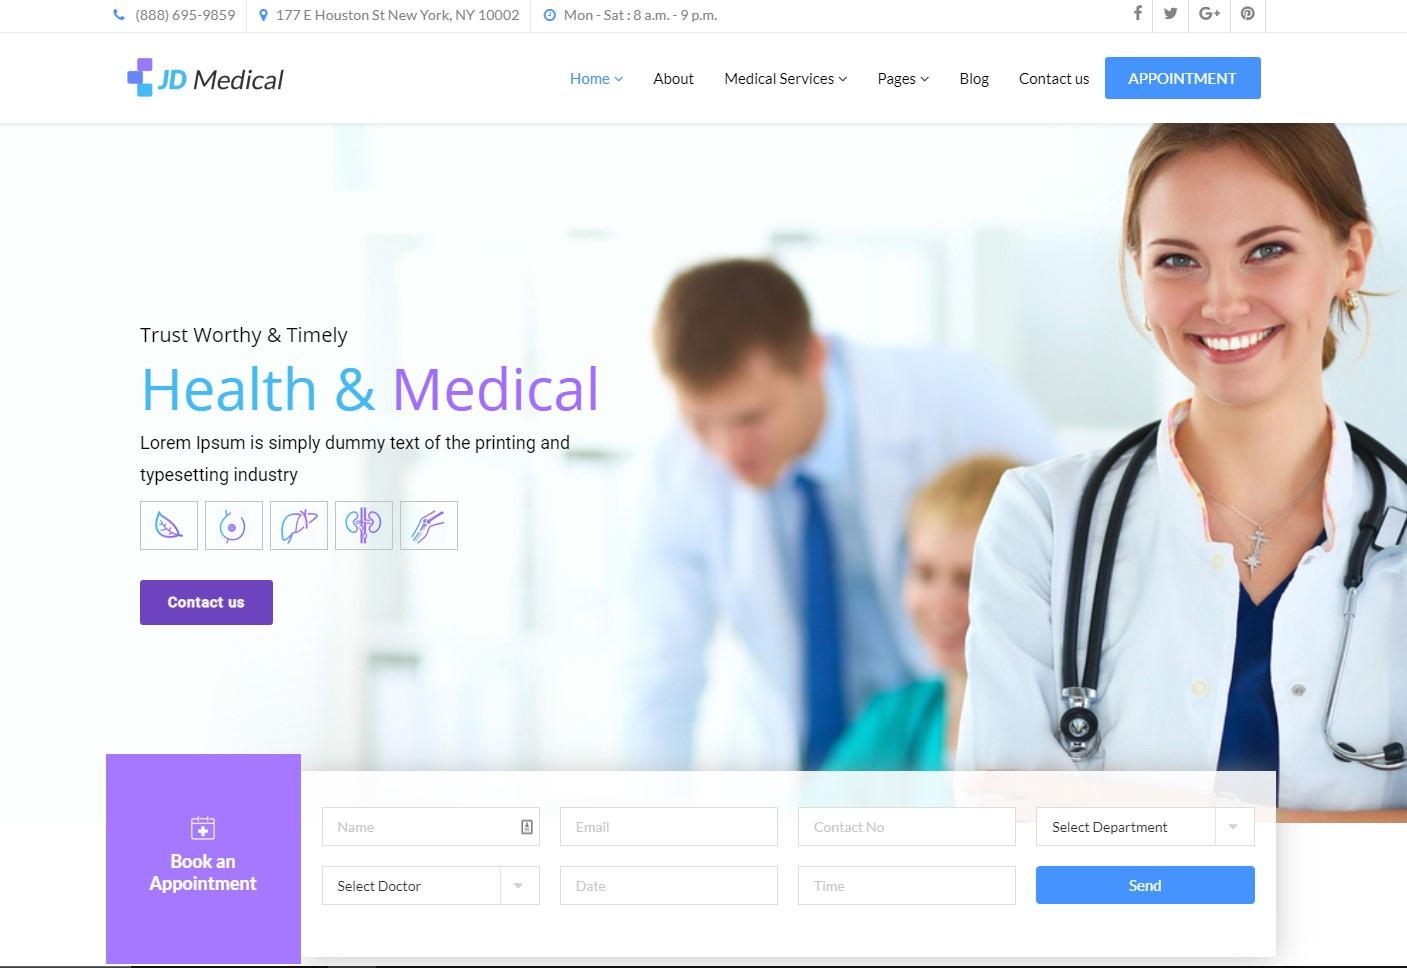 JD_Medical.jpg